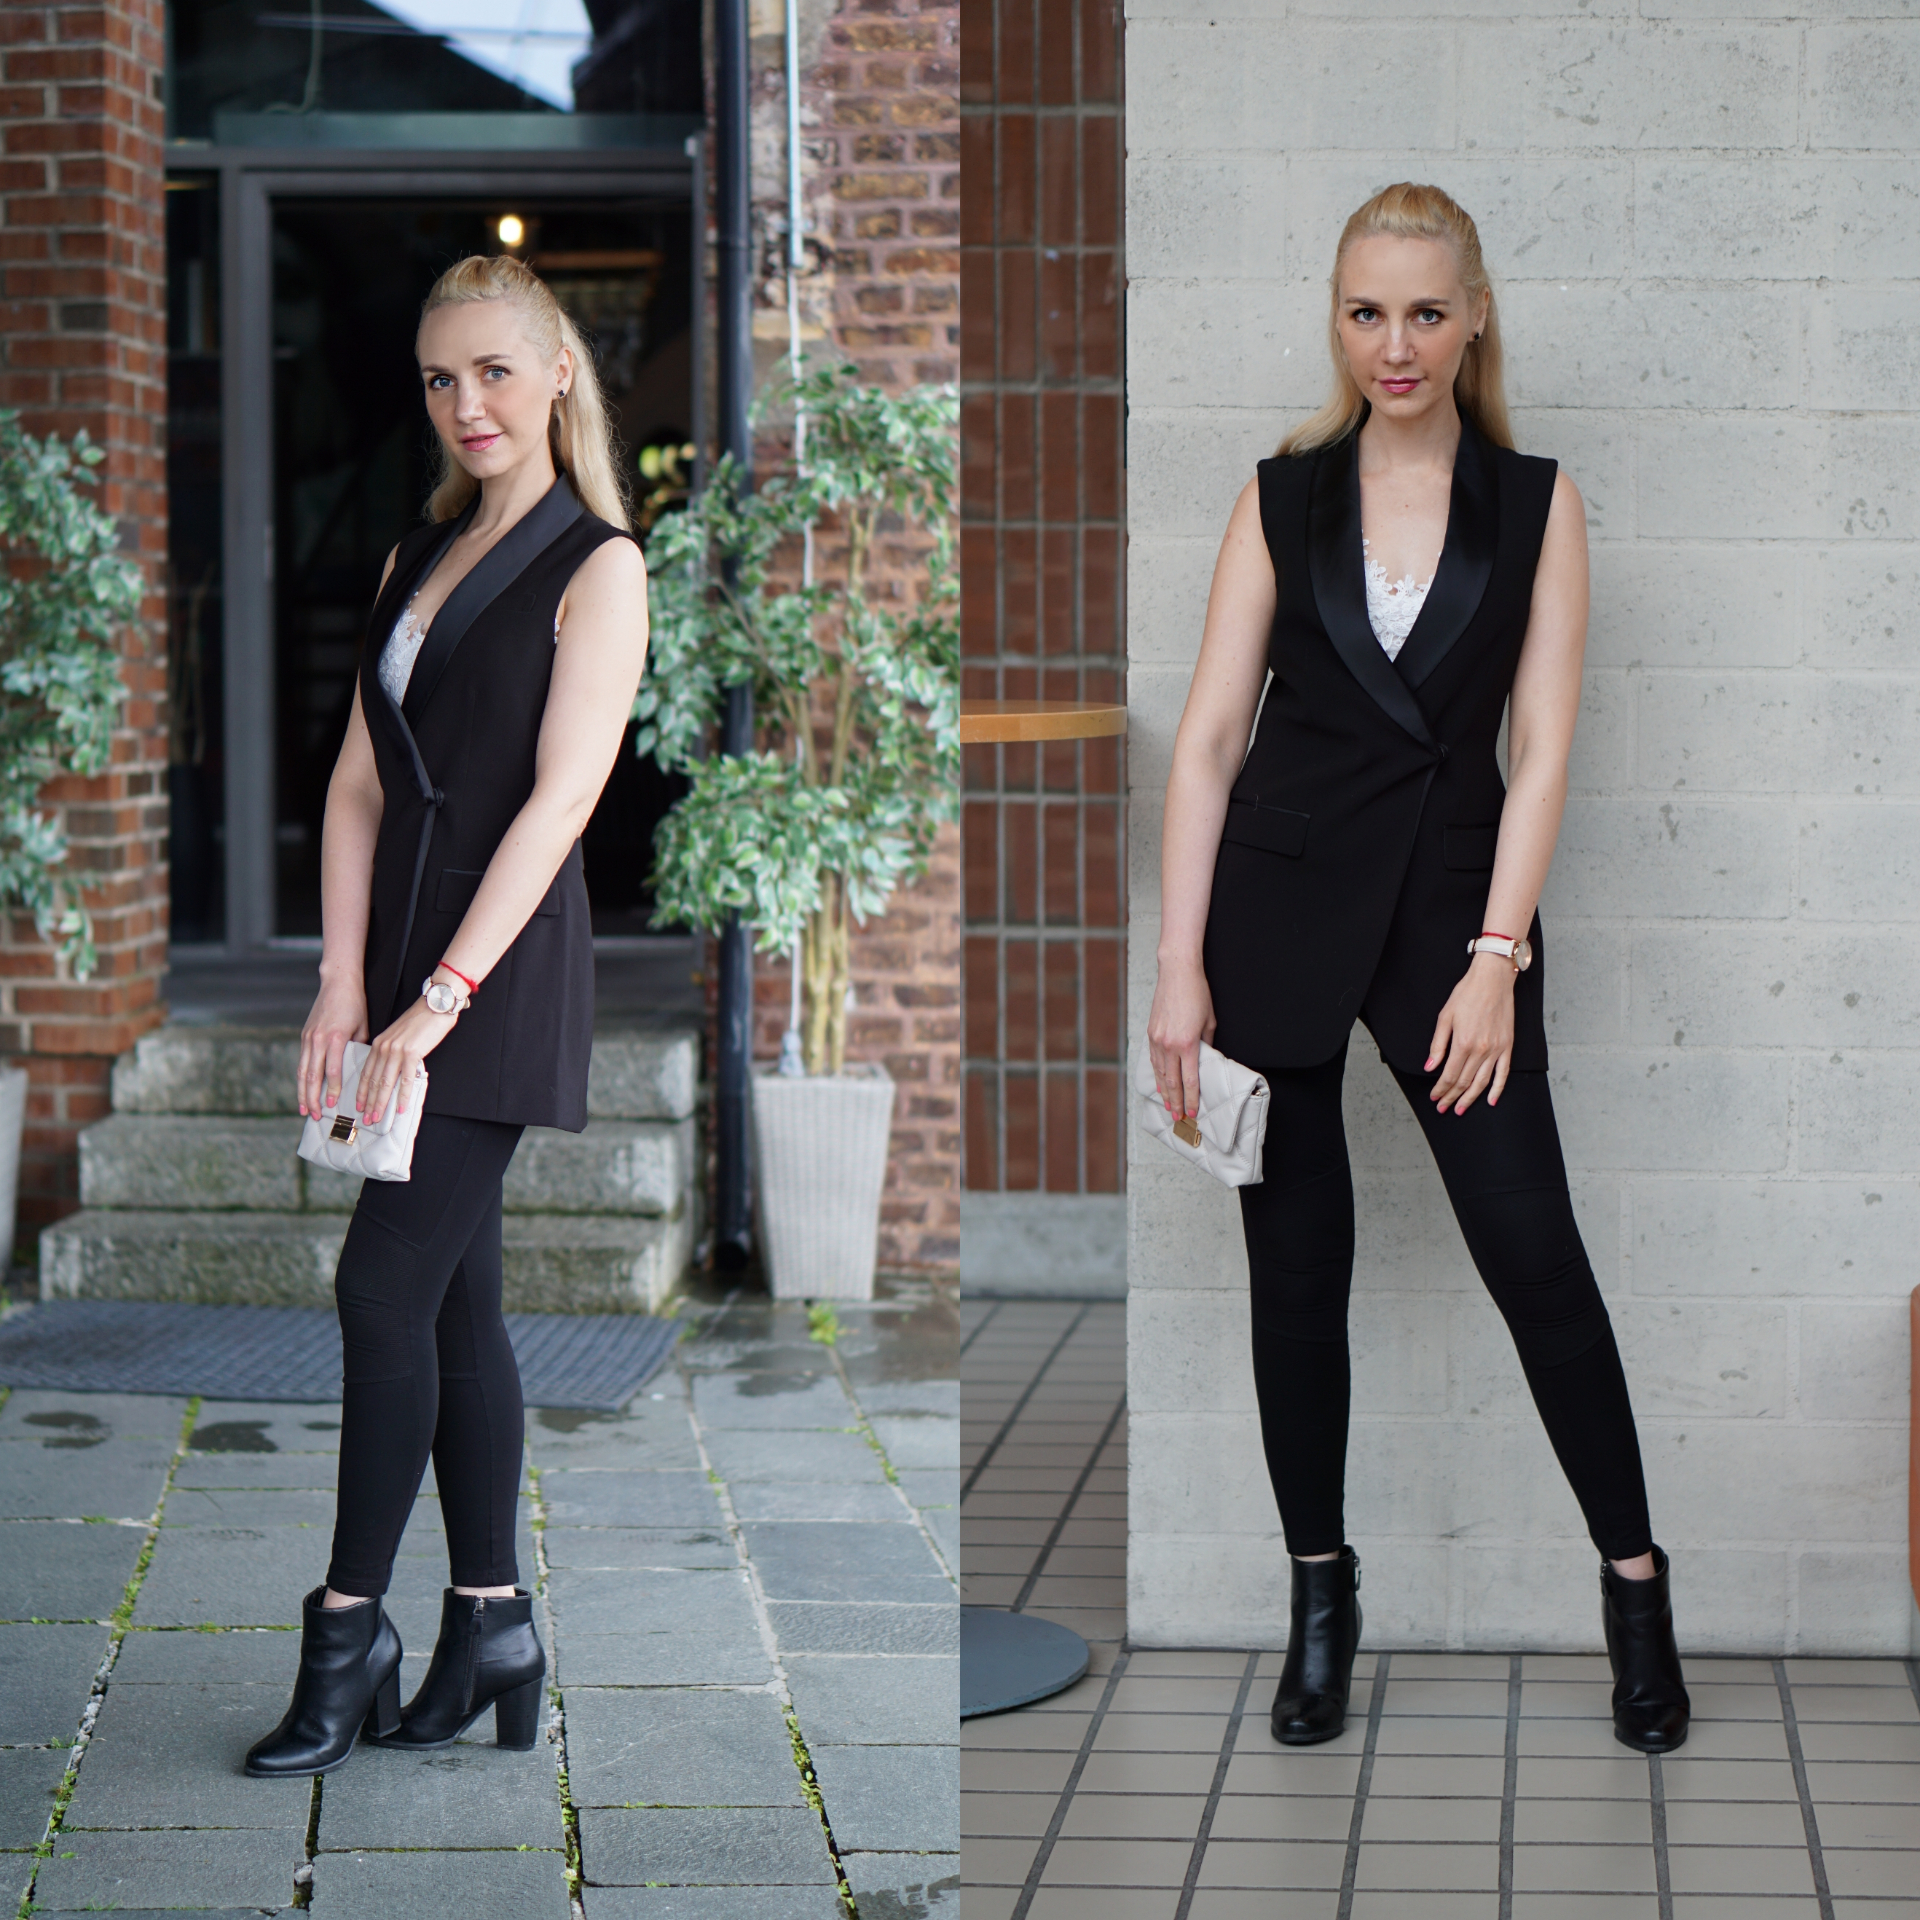 svart dress